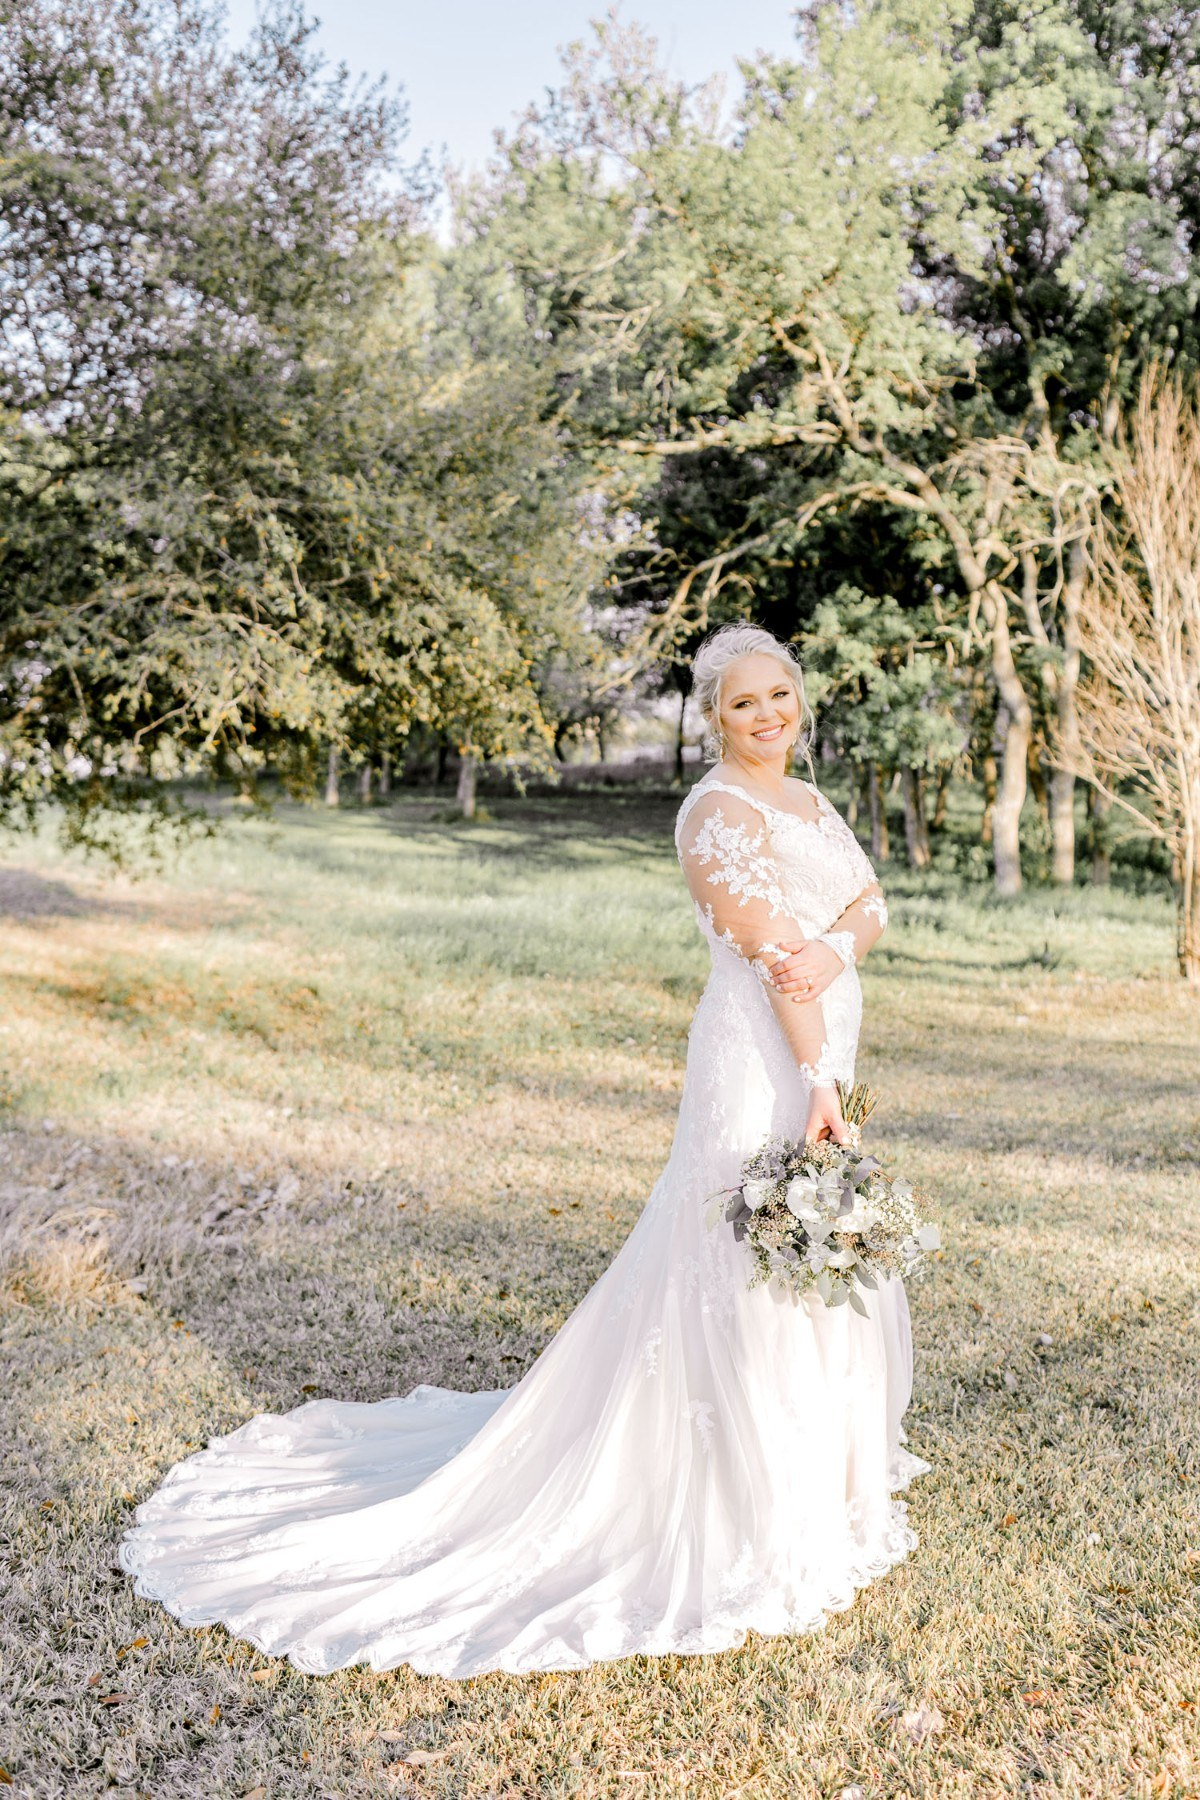 casidy-bridals-tradinghouse-lake-waco-wedding-photographer-kaitlyn-bullard-06.jpg